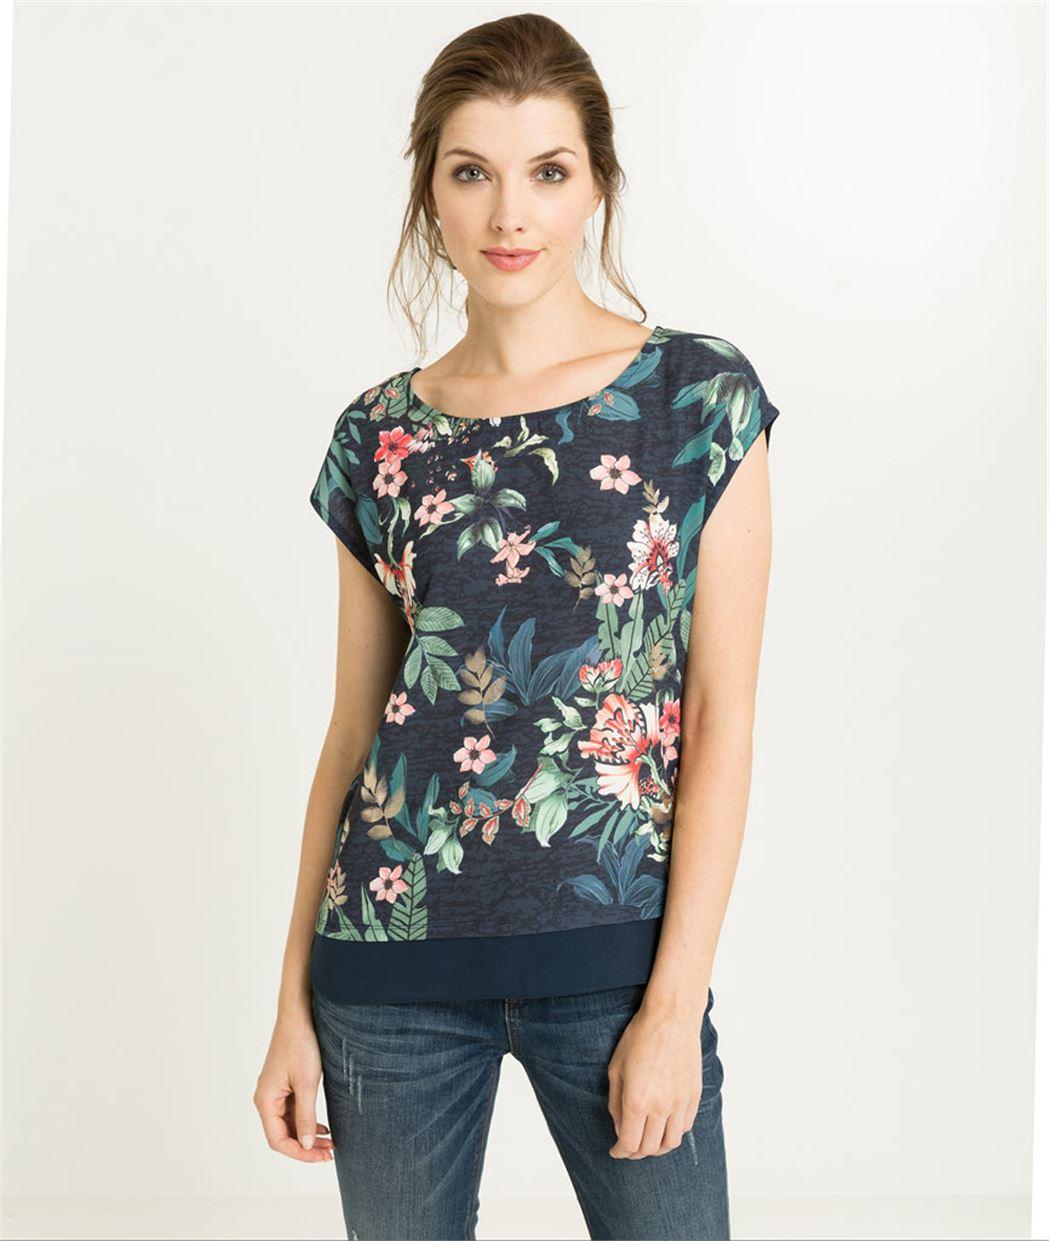 T-shirt femme bi-matière imprimé fleuri MARINE